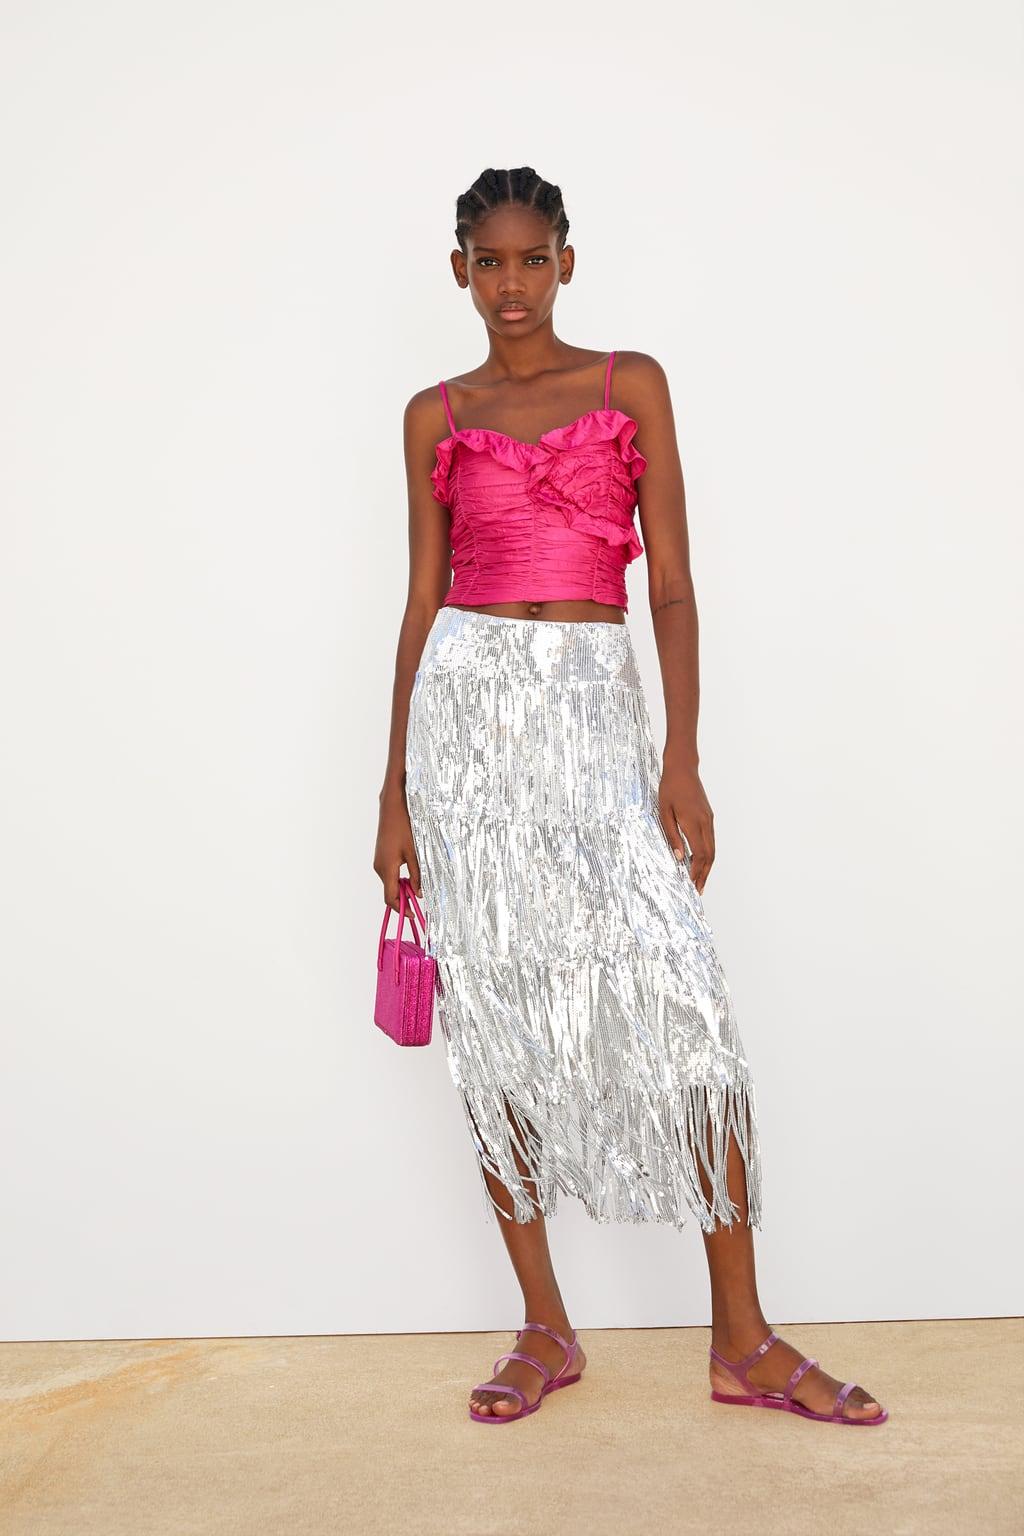 https://www.zara.com/ca/en/limited-edition-fringed-sequin-skirt-p07901169.html?v1=14585618&v2=1282602